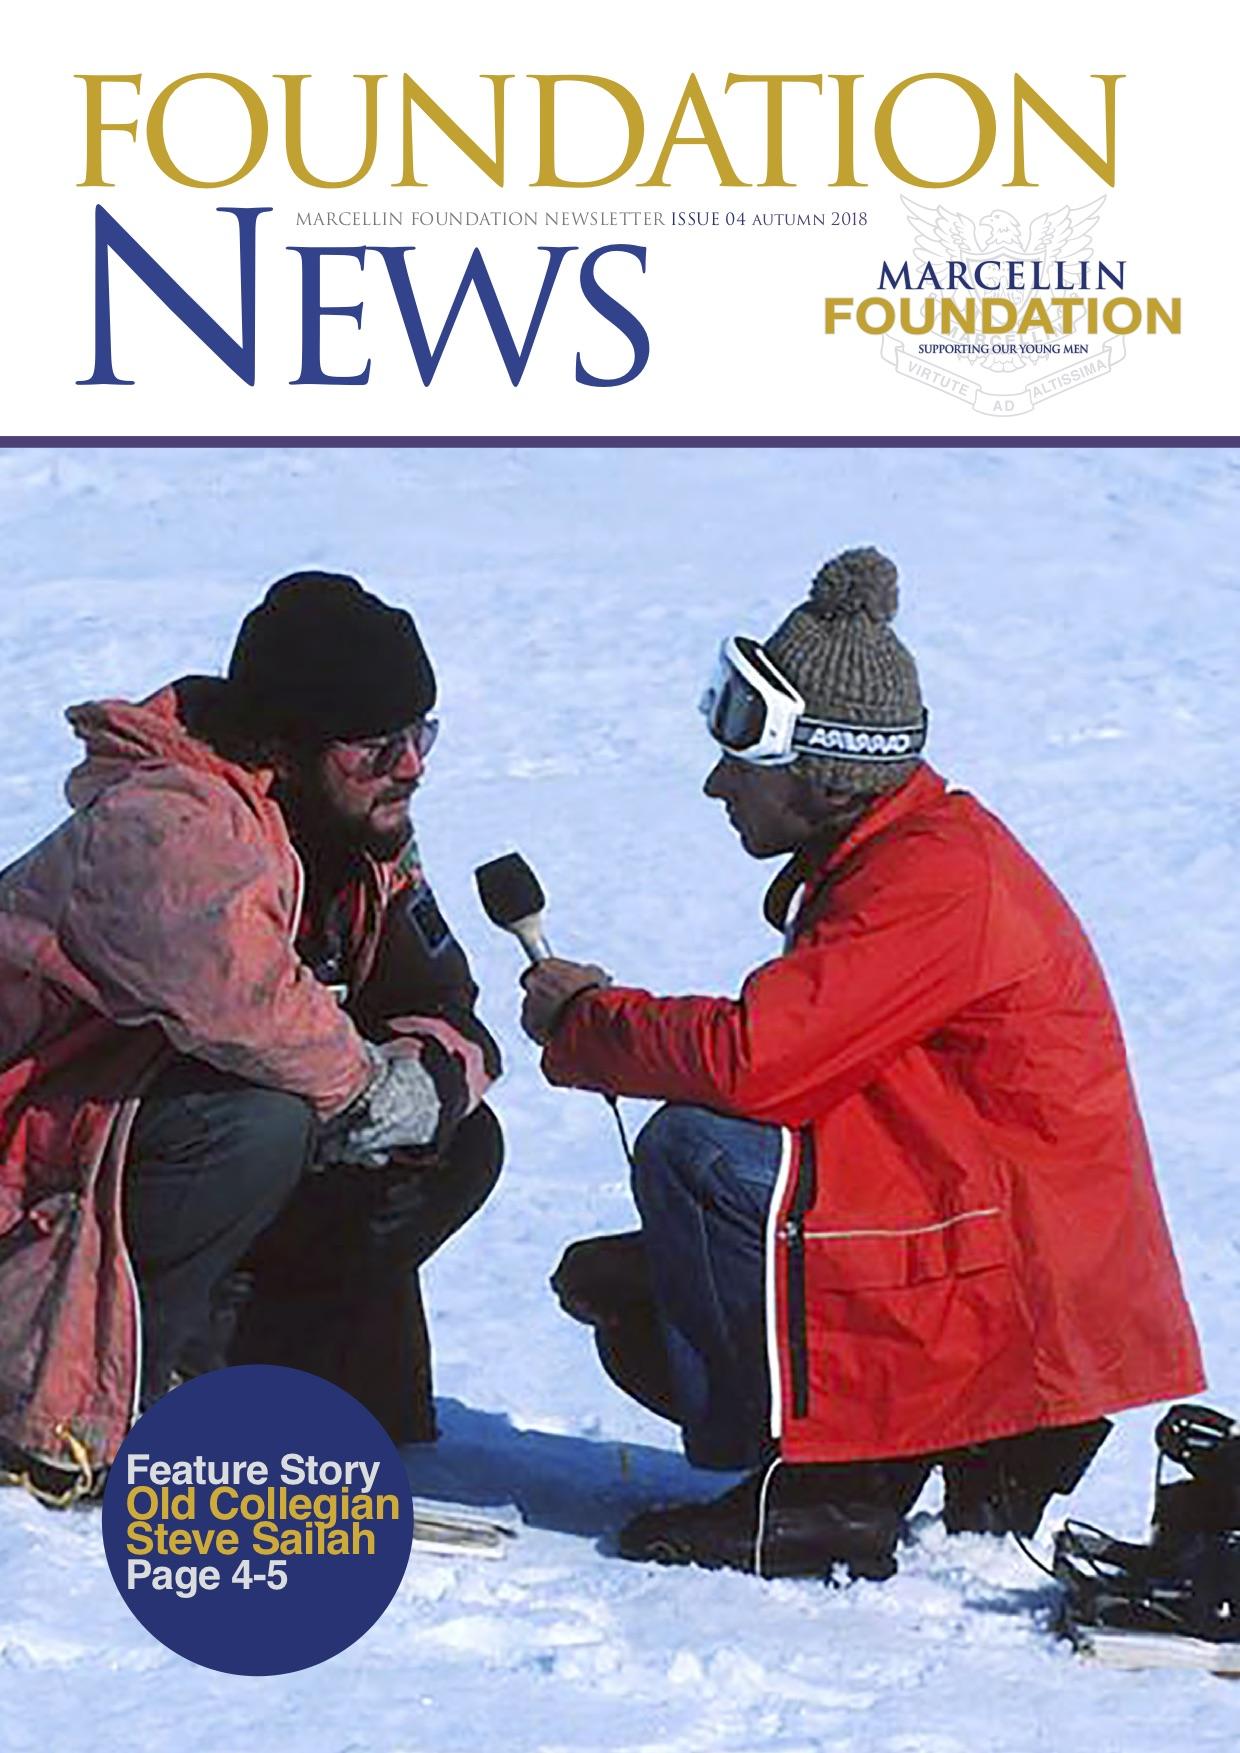 2424 Foundation News Edits 26 February.jpg